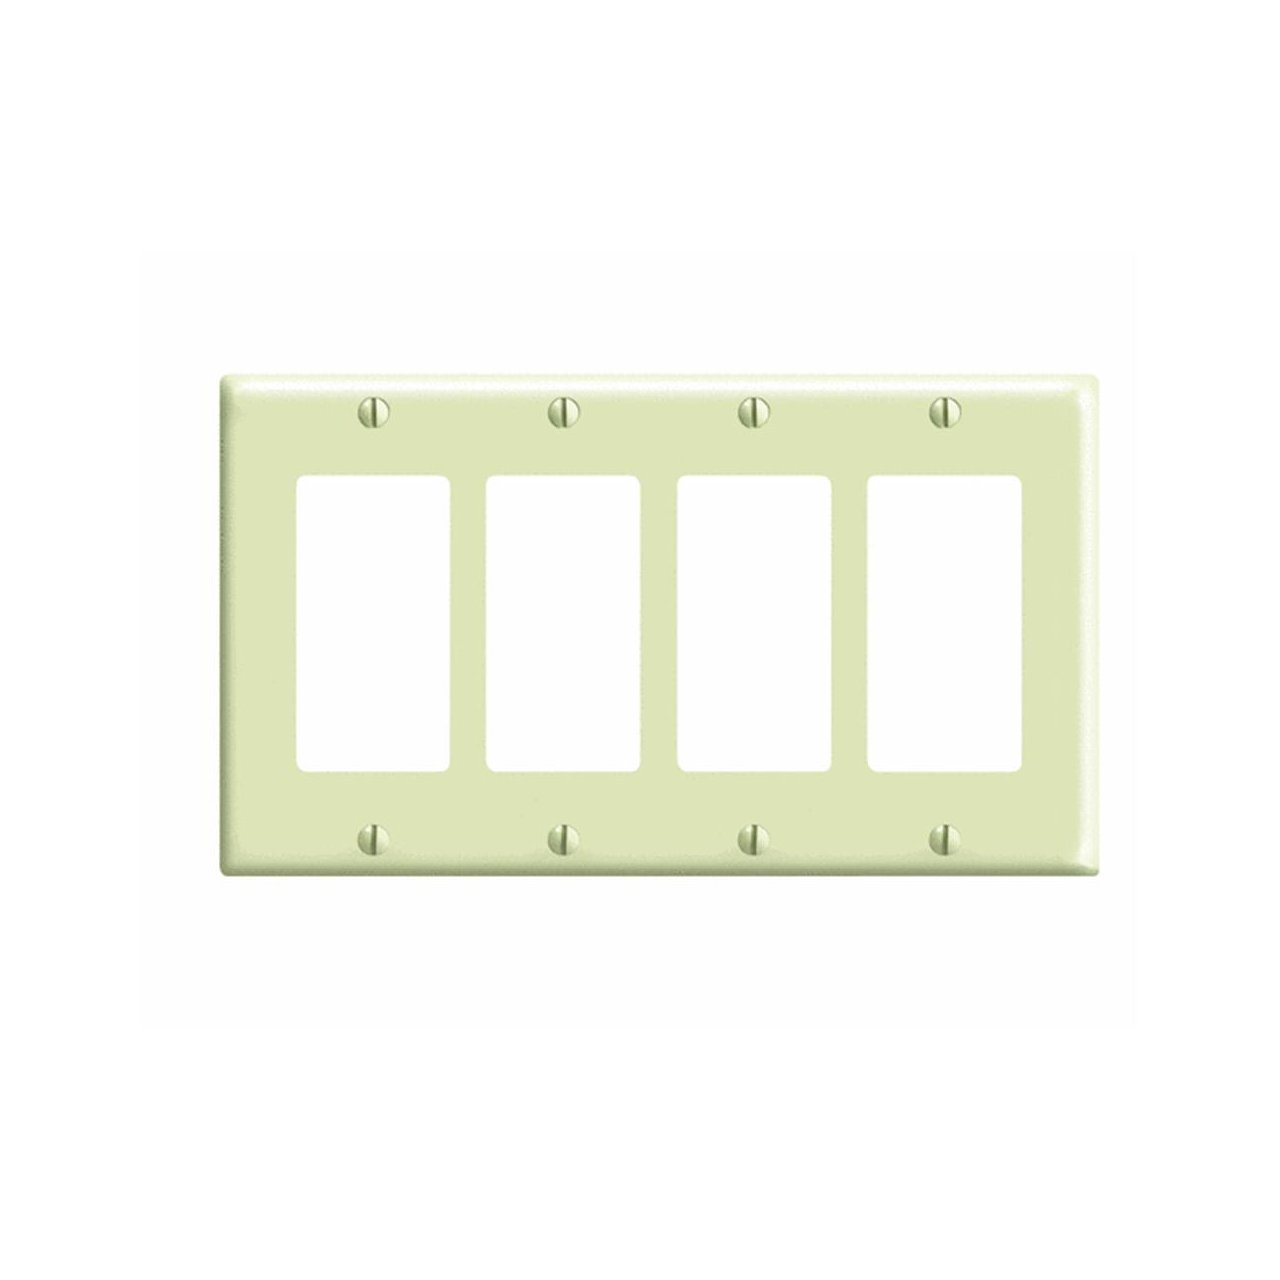 Leviton 80412-I 4-Gang Decora/GFCI Device Decora Wallplate, Standard ...